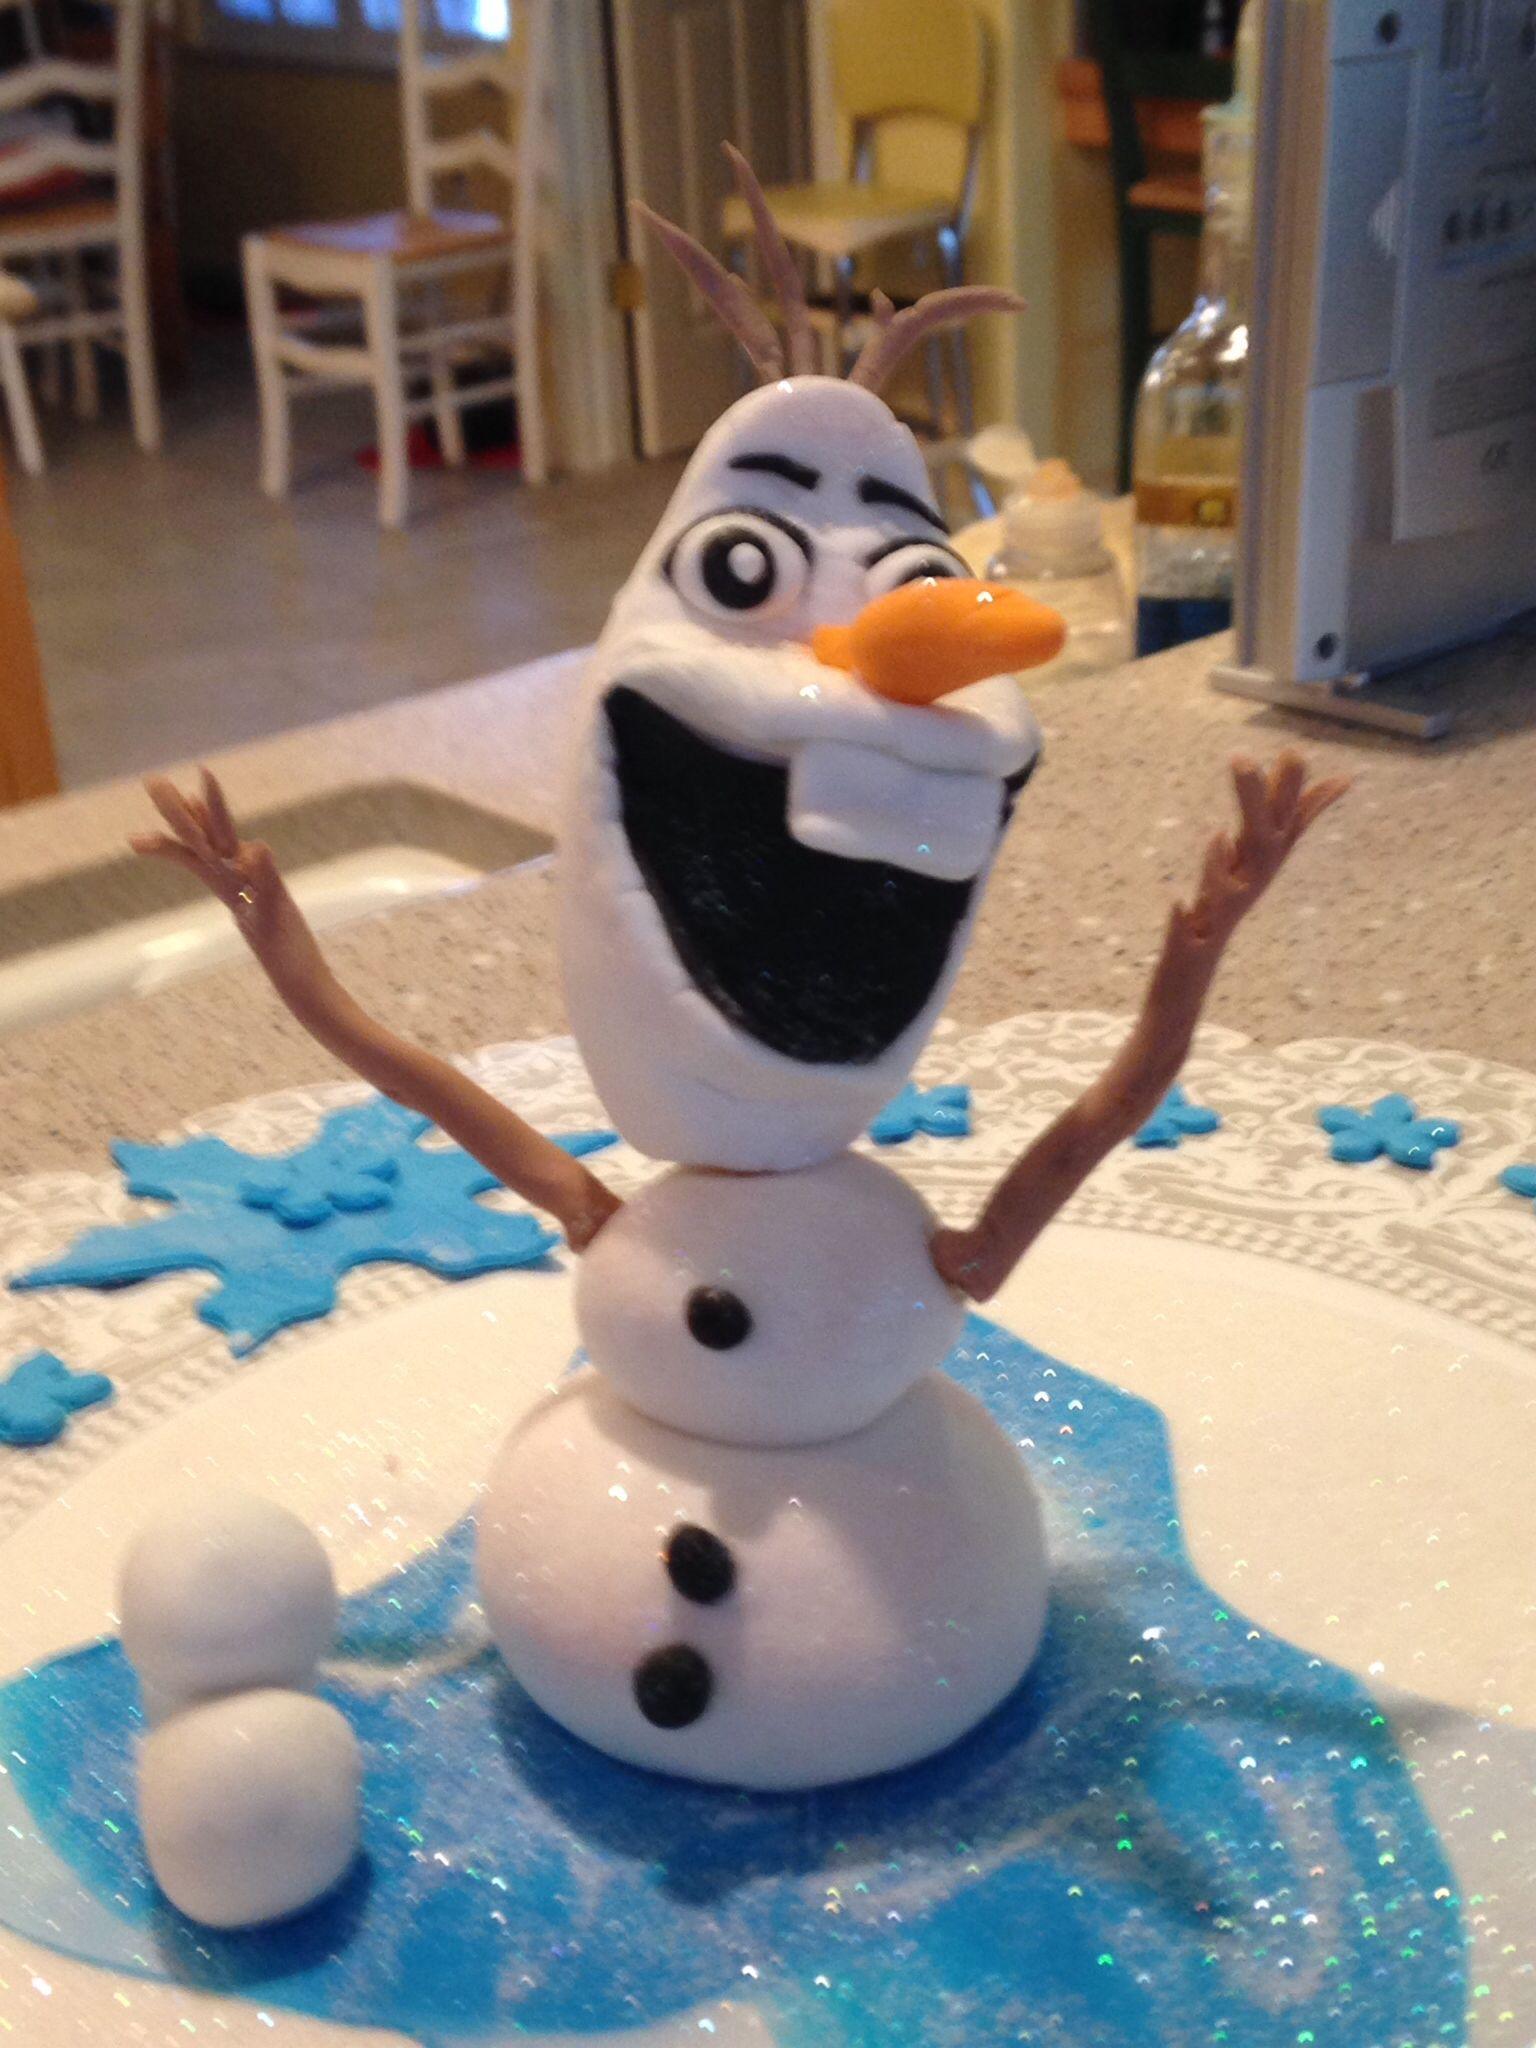 Olaf cake topper Disney Movie Frozen by Facebookacakelady This